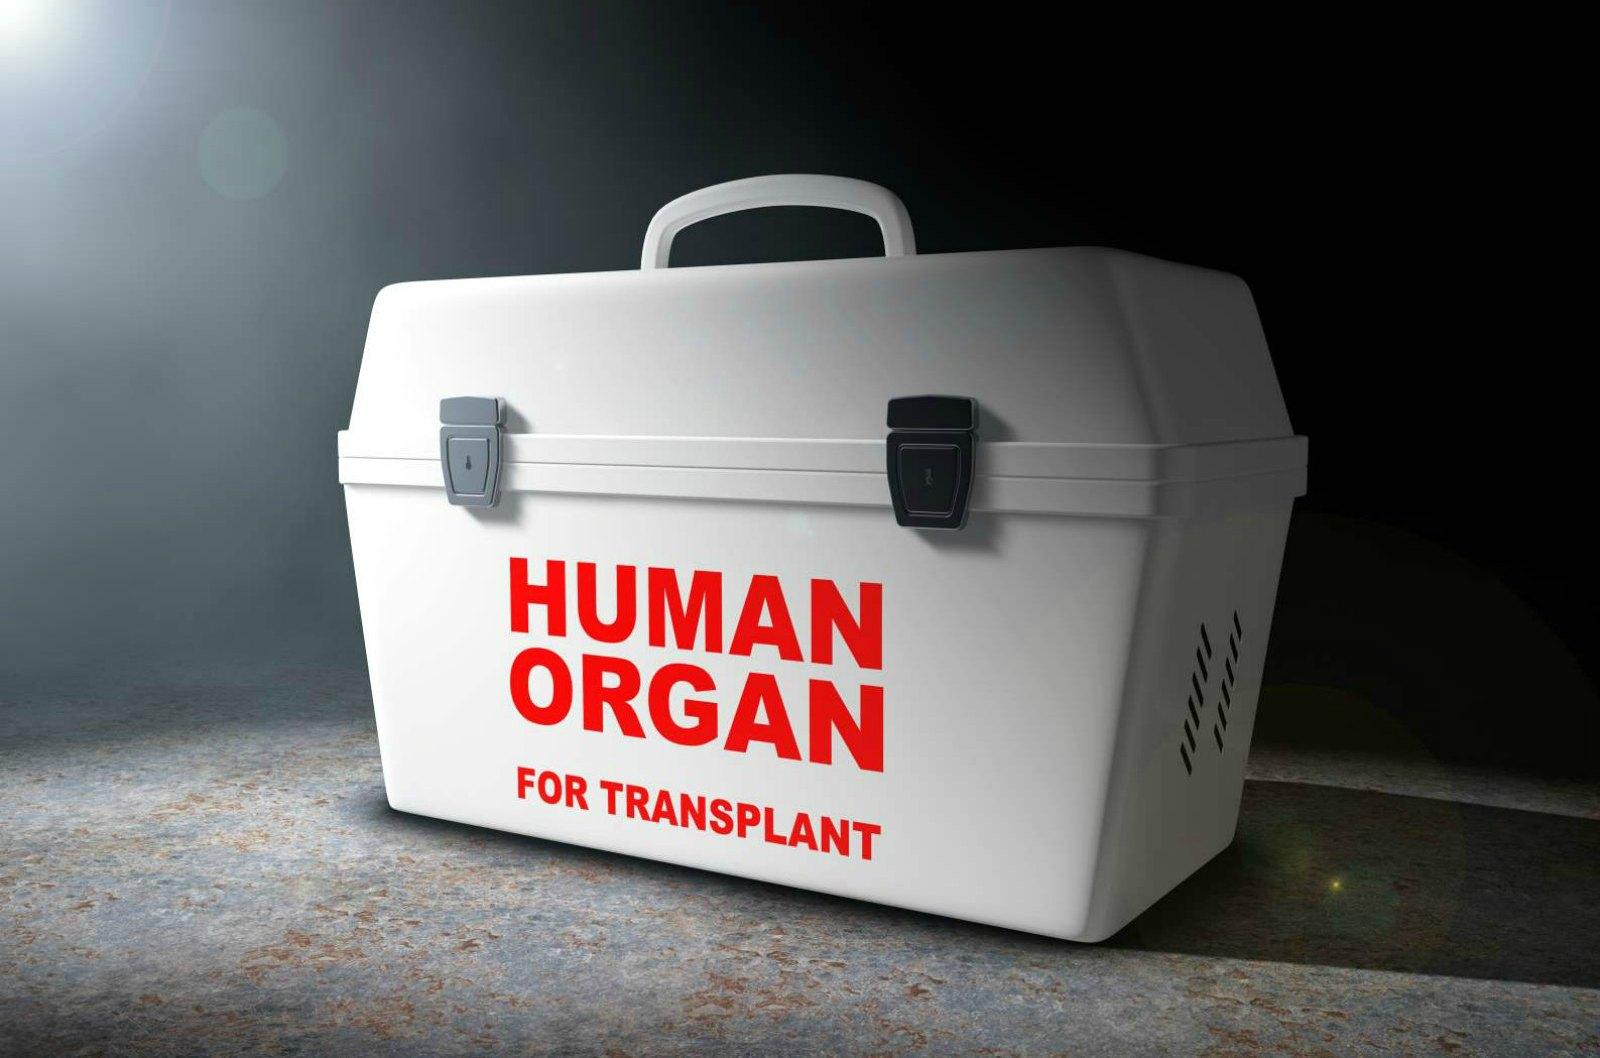 Researchers Improve Storage forTransplant Organs